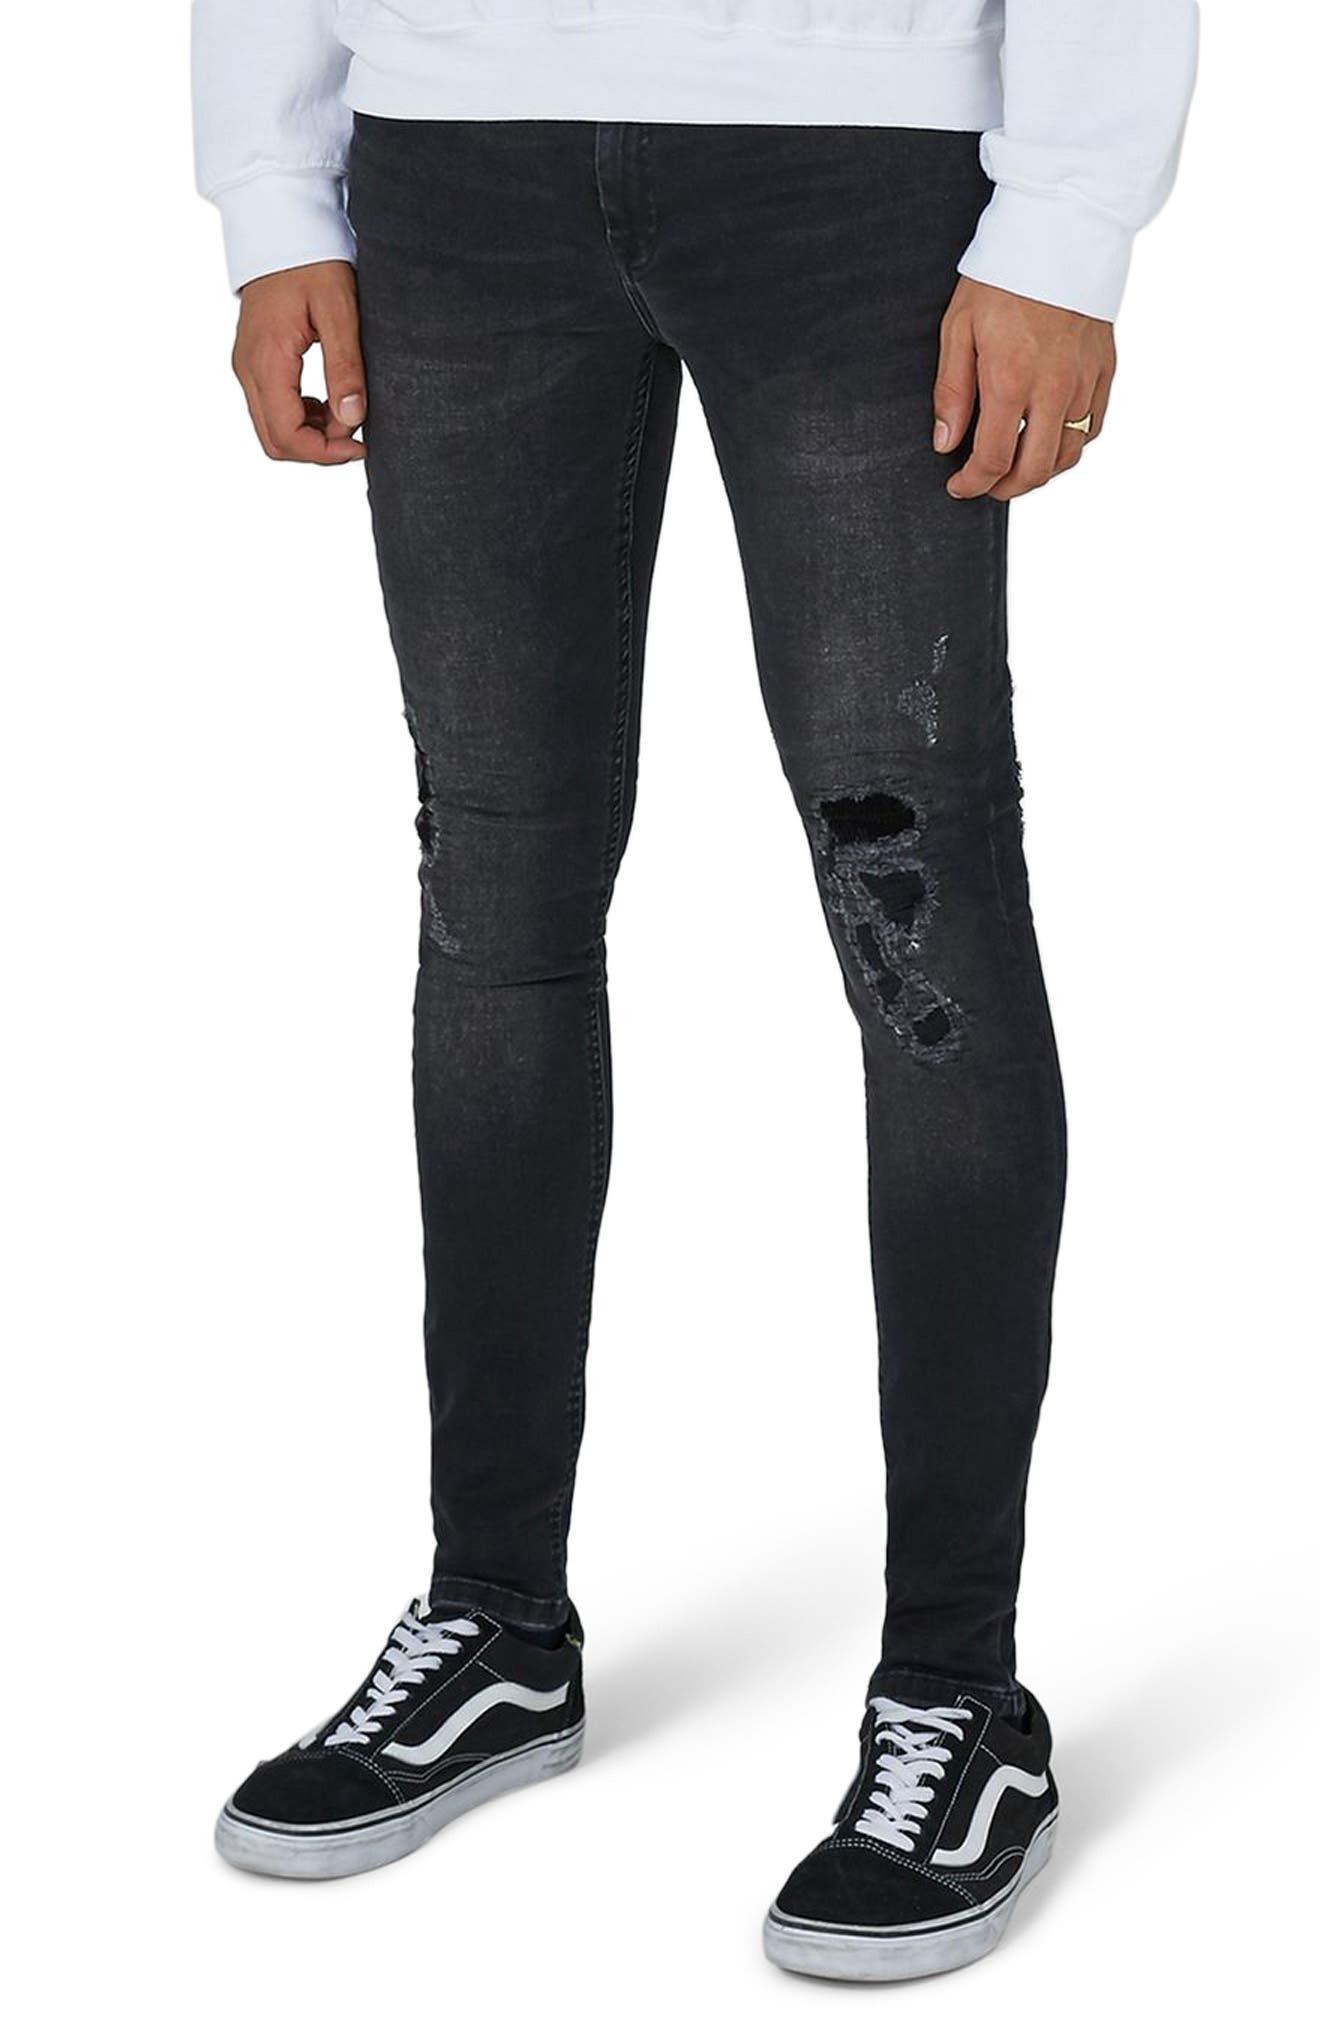 Repair Spray-On Skinny Fit Jeans,                             Main thumbnail 1, color,                             001